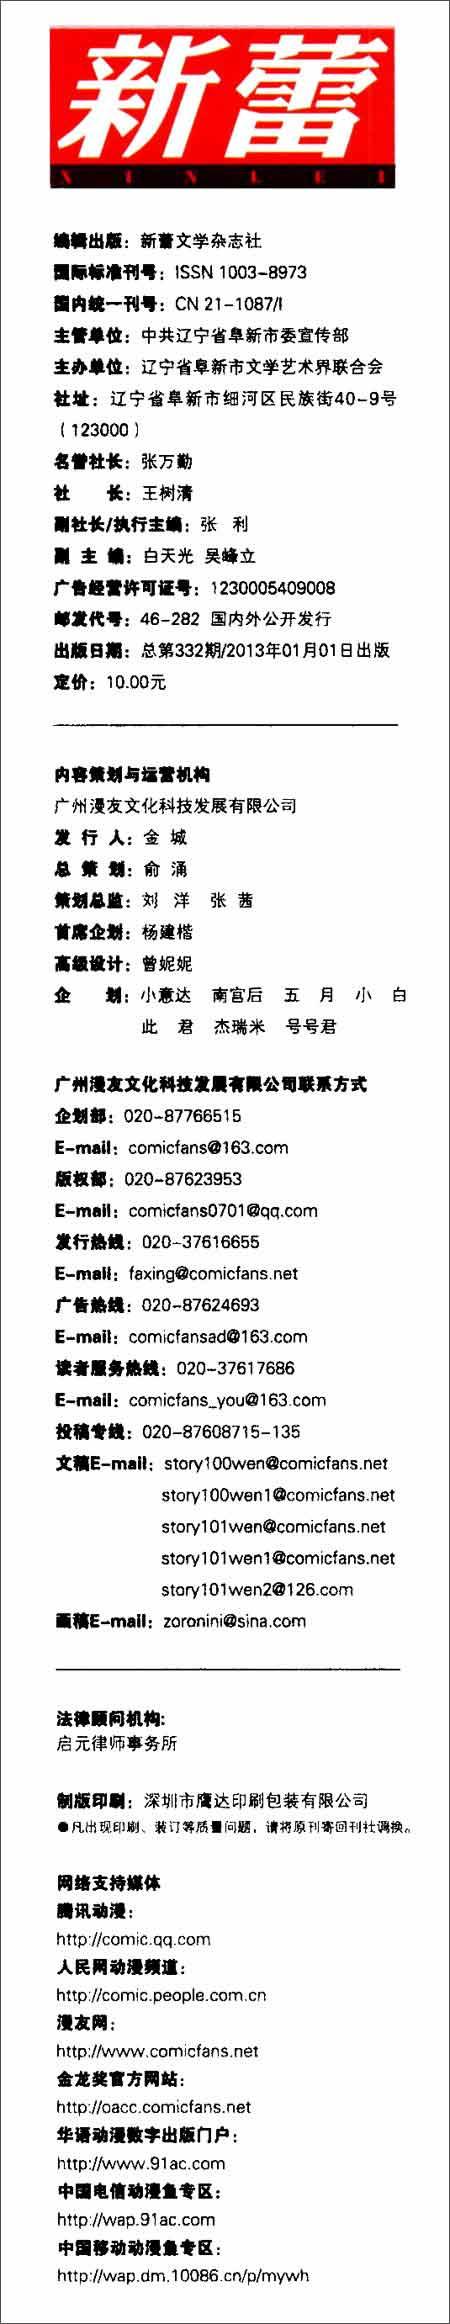 新蕾青春志:2013年1月刊